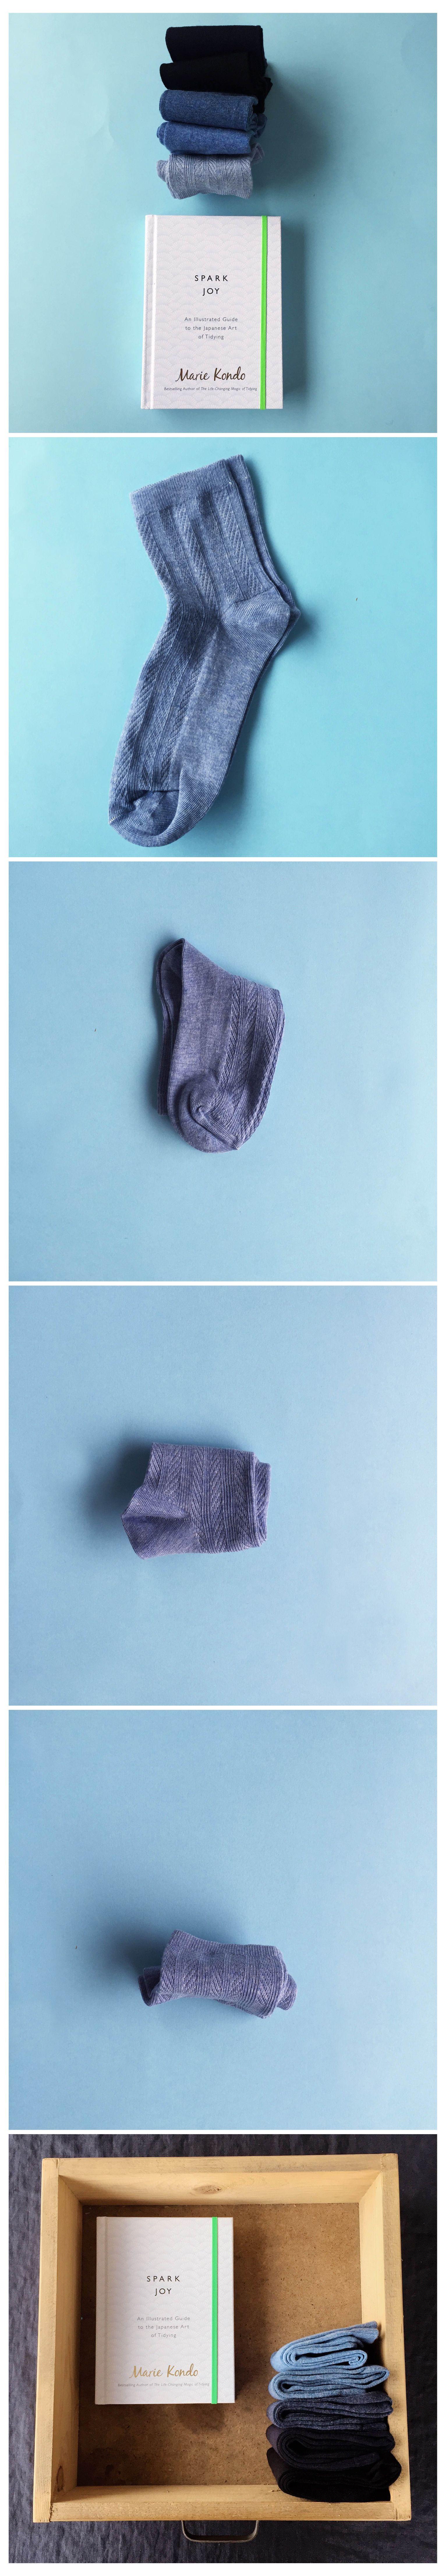 folding socks with illustrated spark joy by marie kondo. Black Bedroom Furniture Sets. Home Design Ideas